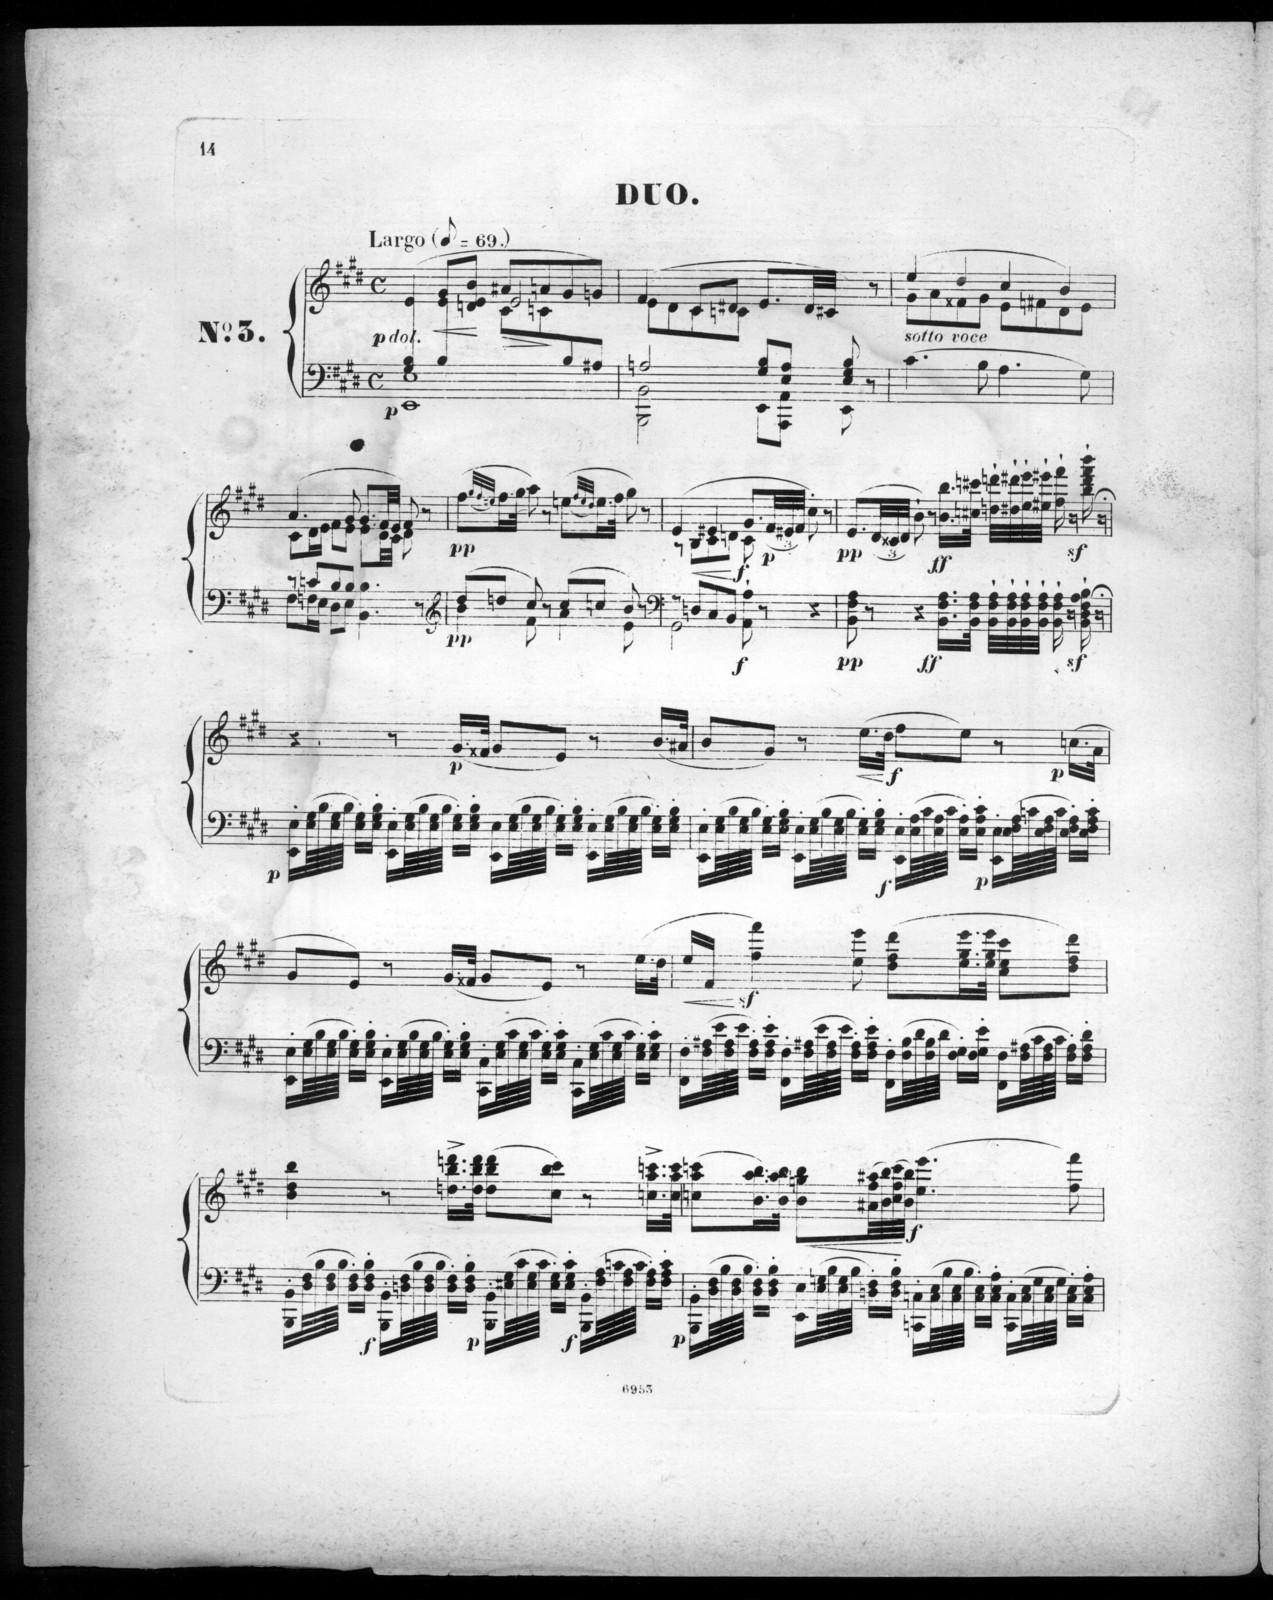 Stabat Mater de Rossini, Duo